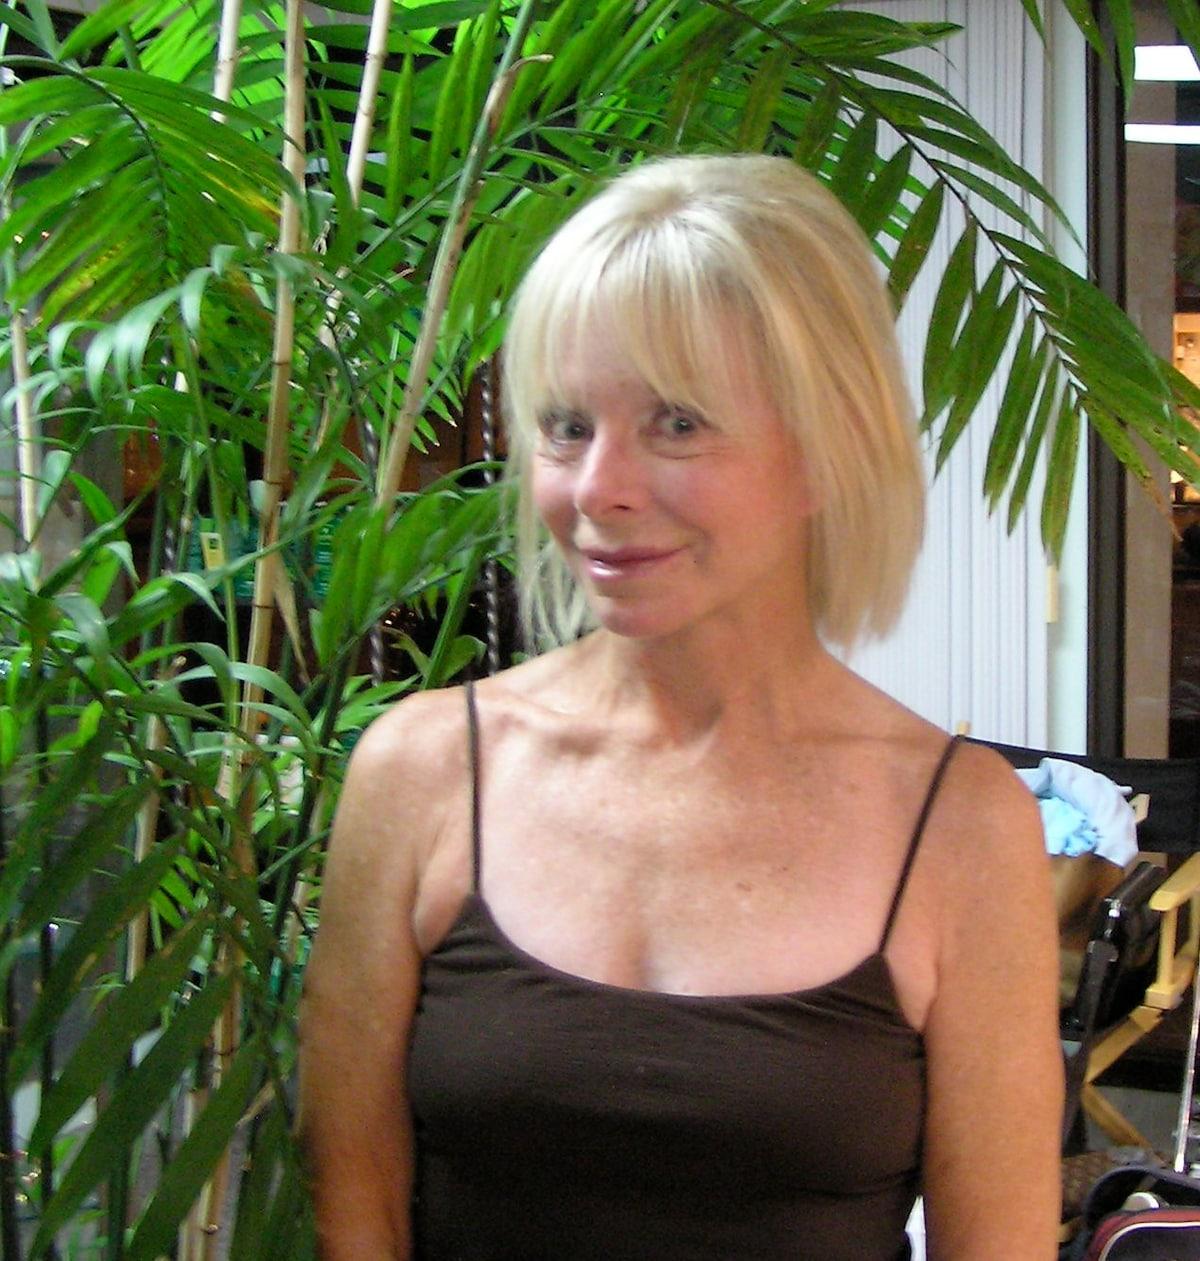 Susan from Malibu